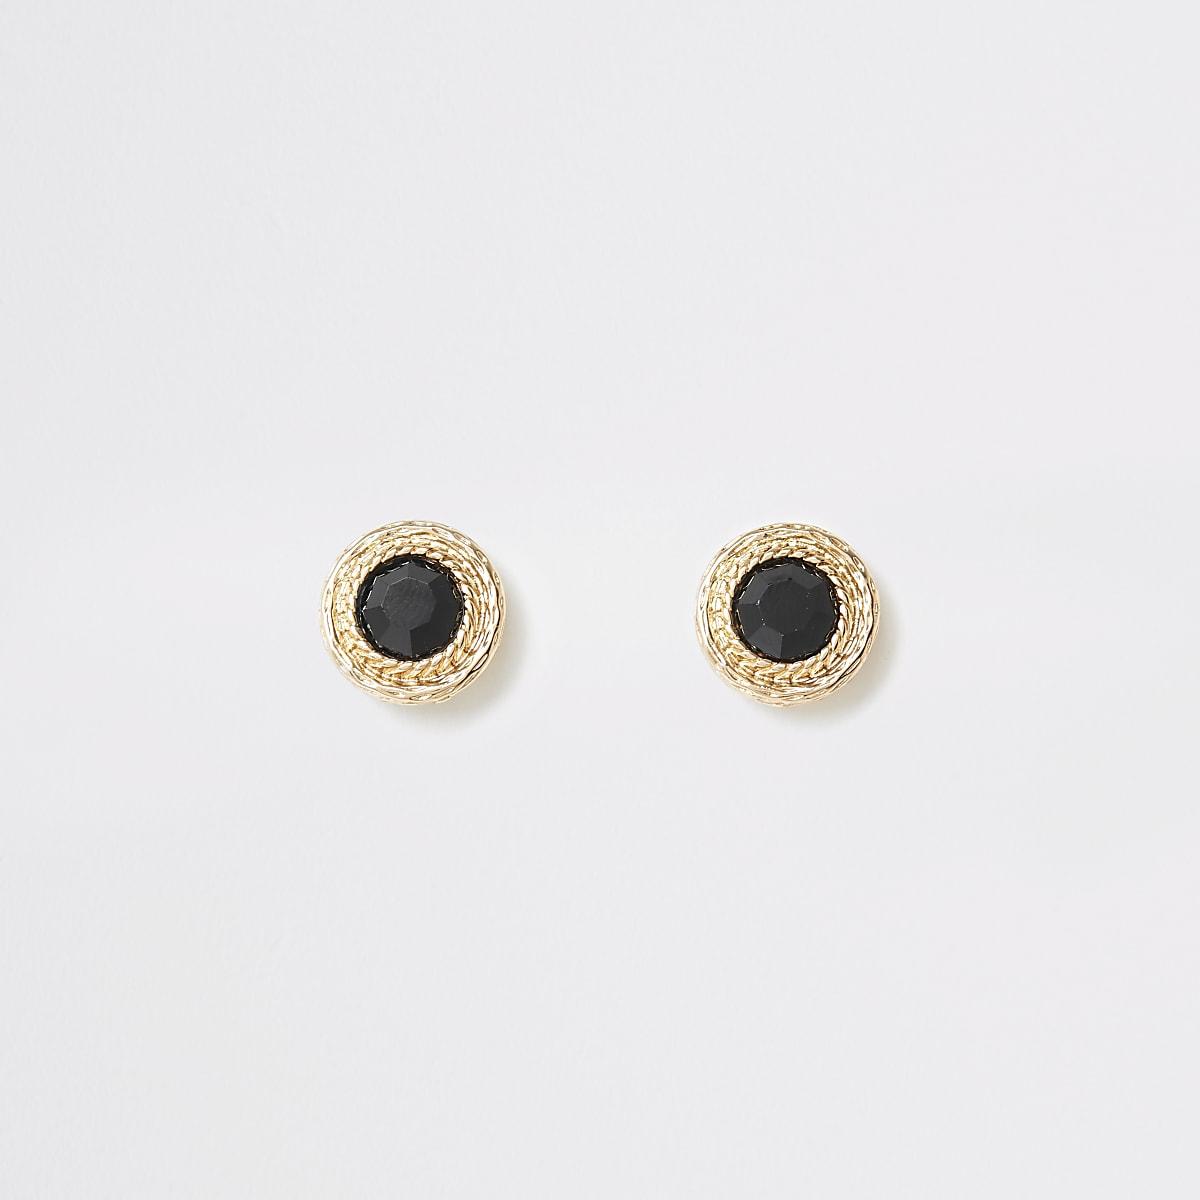 Gold color jewel stud earrings